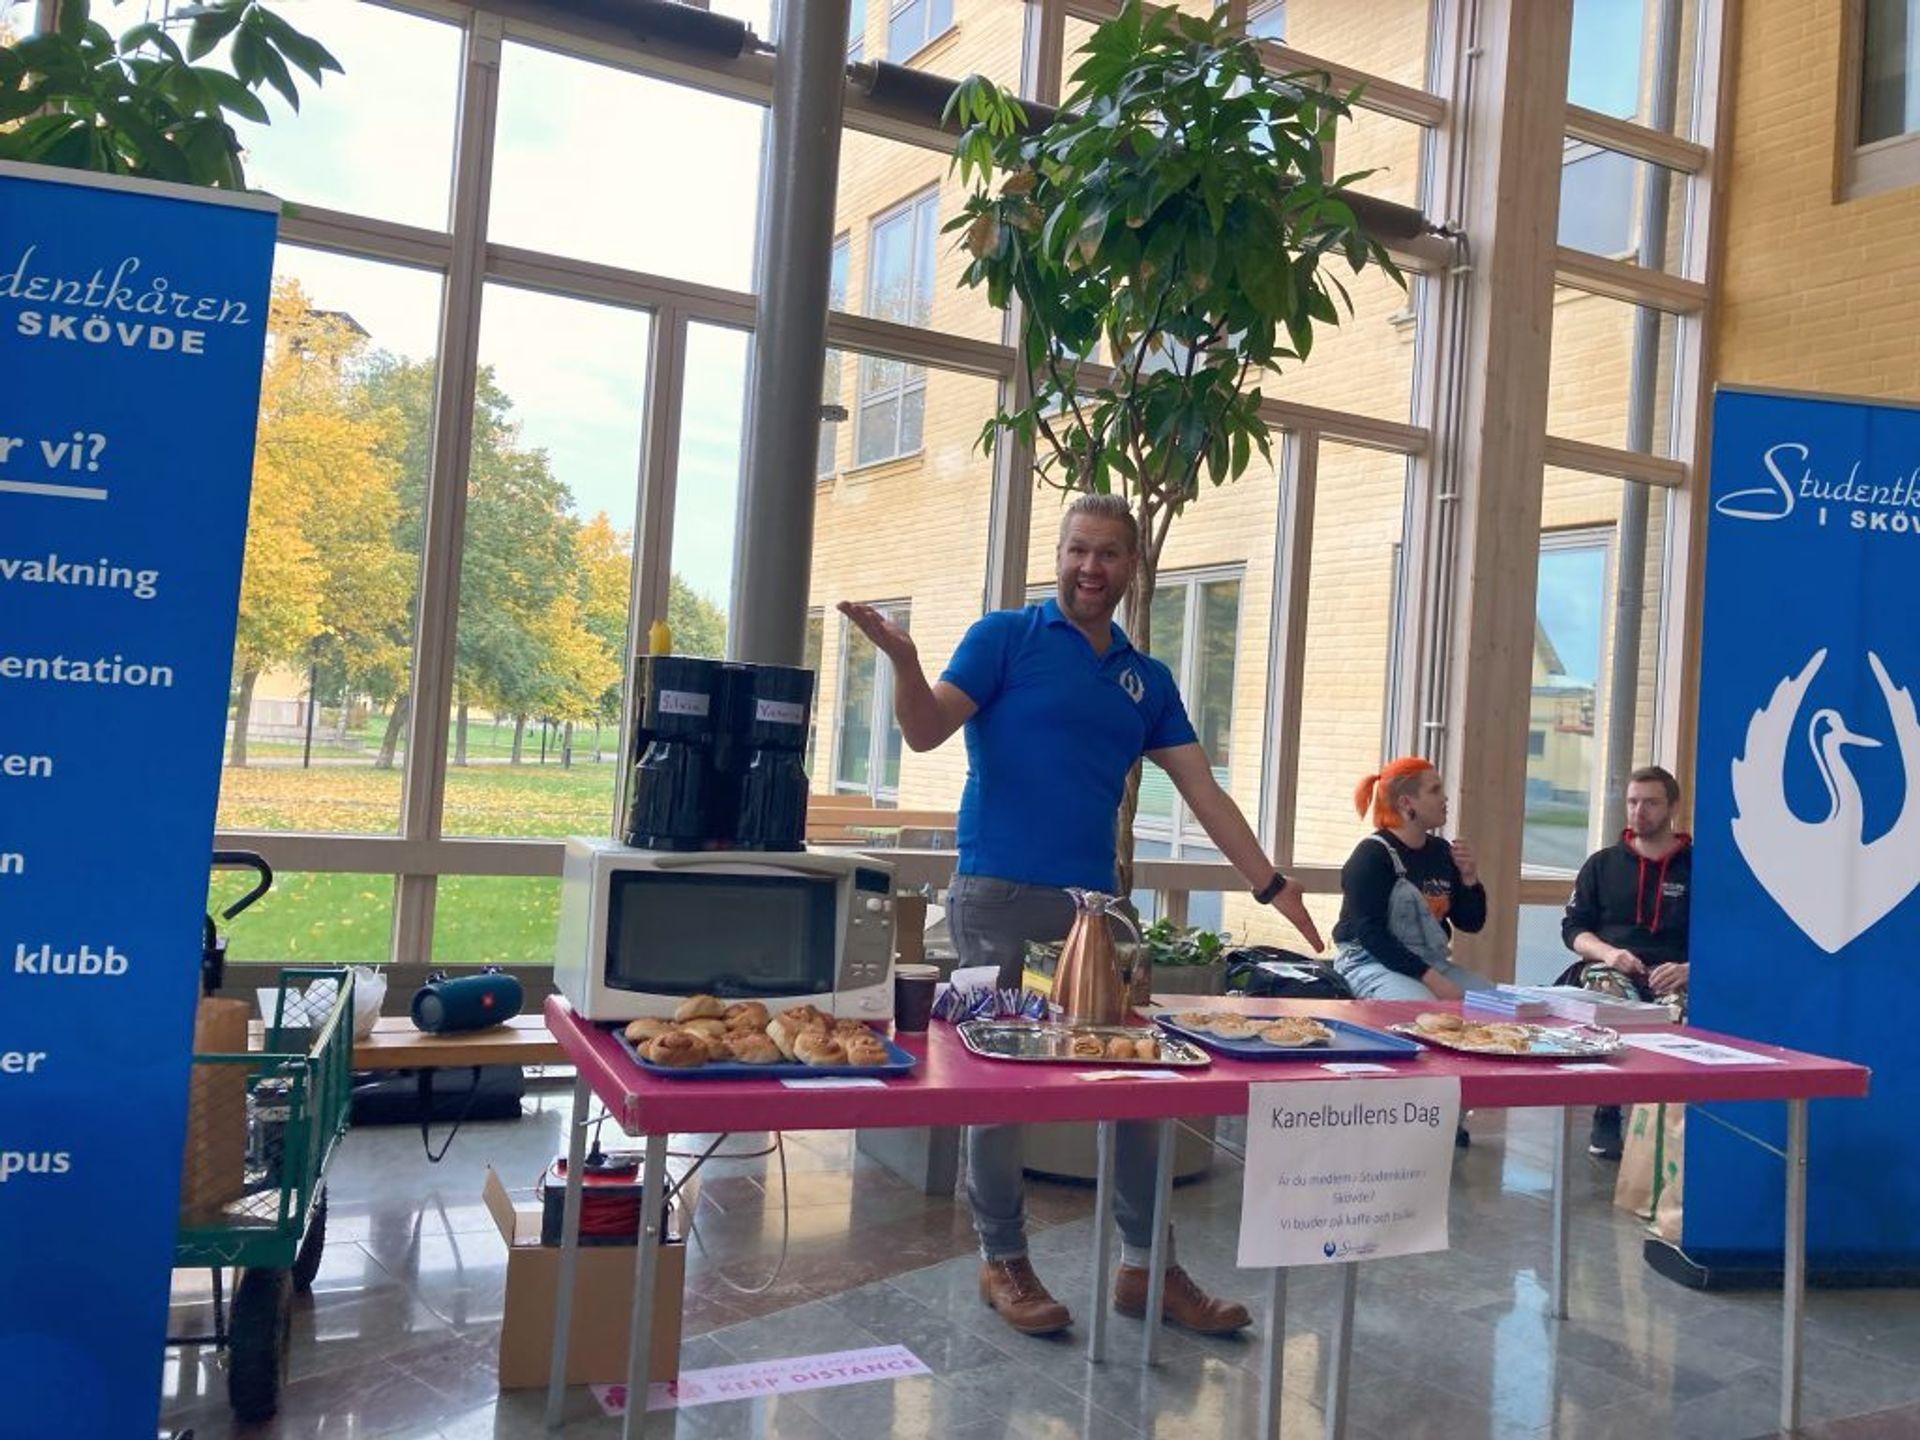 People offering free cinnamon rolls at the University of Skövde.